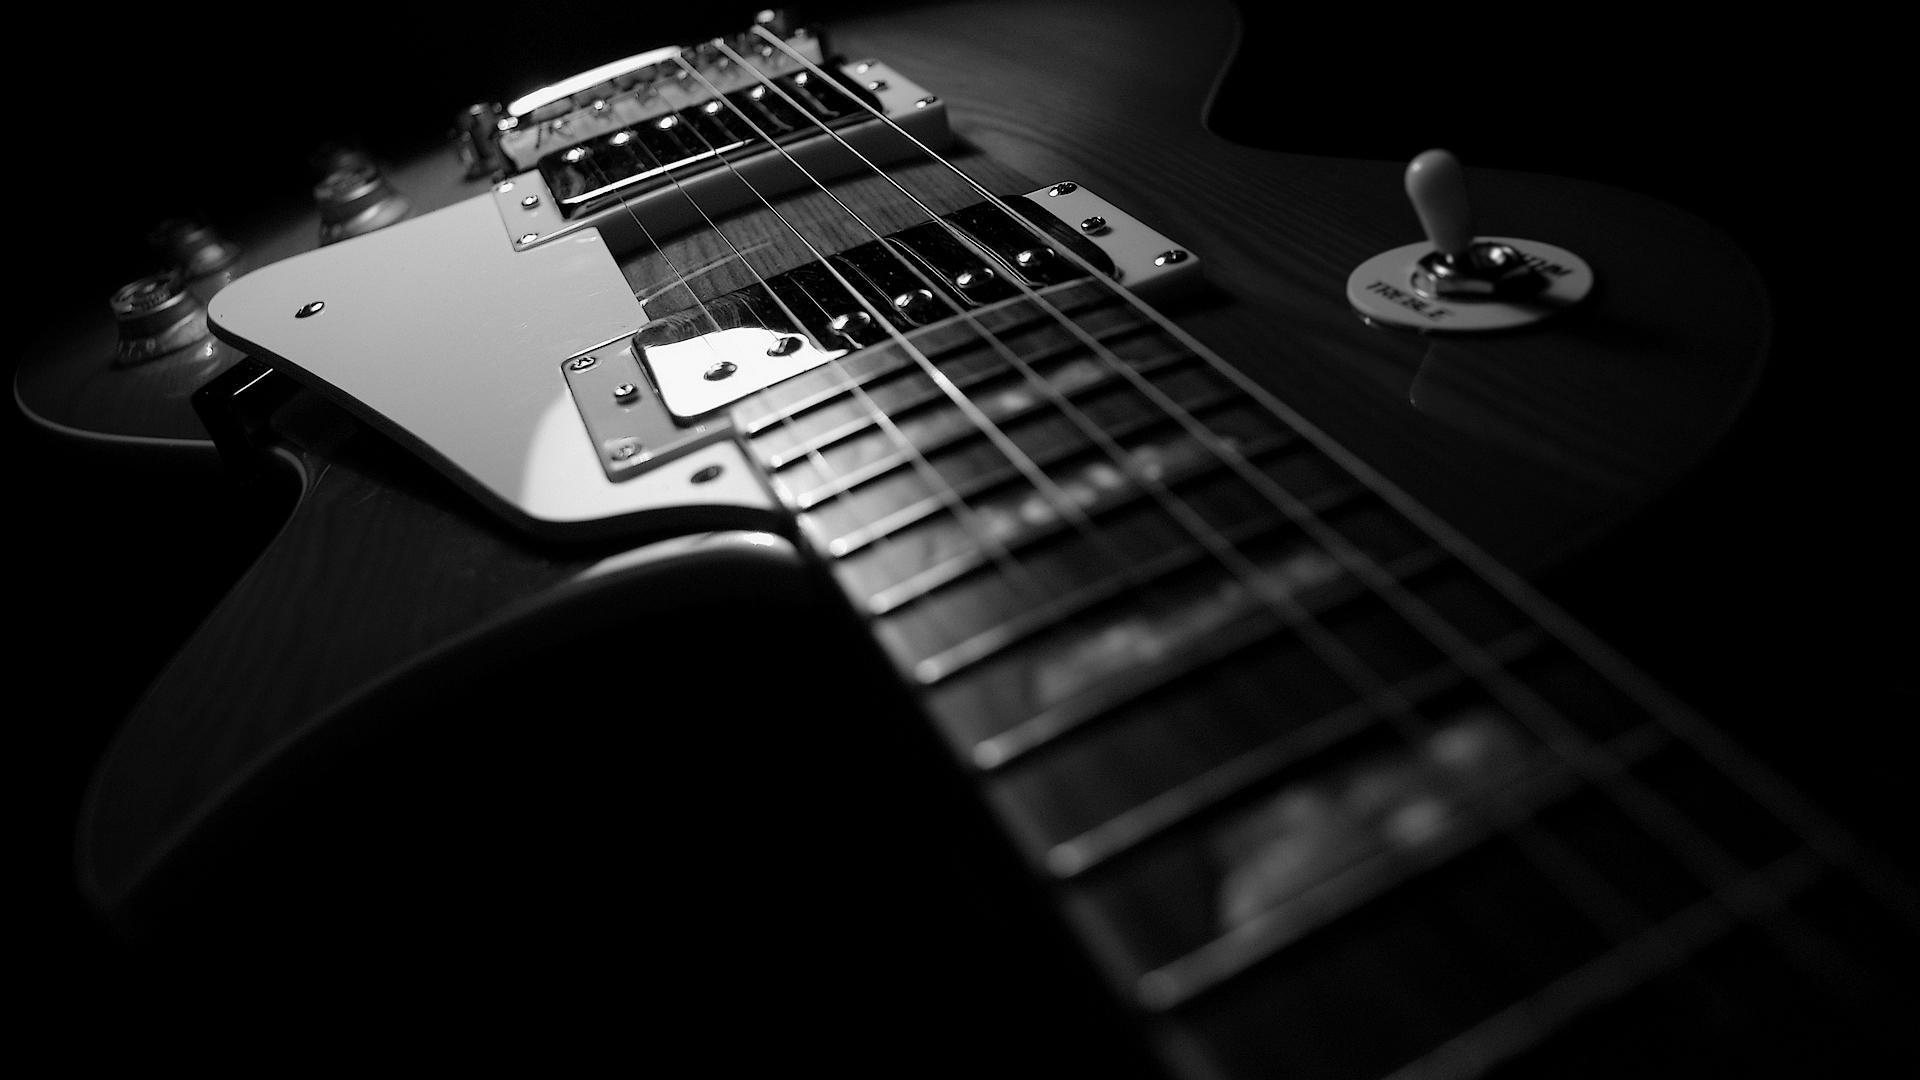 Gallery Mac Wallpapers Fender Desktop Guitar Rock Music Background 1920x1080